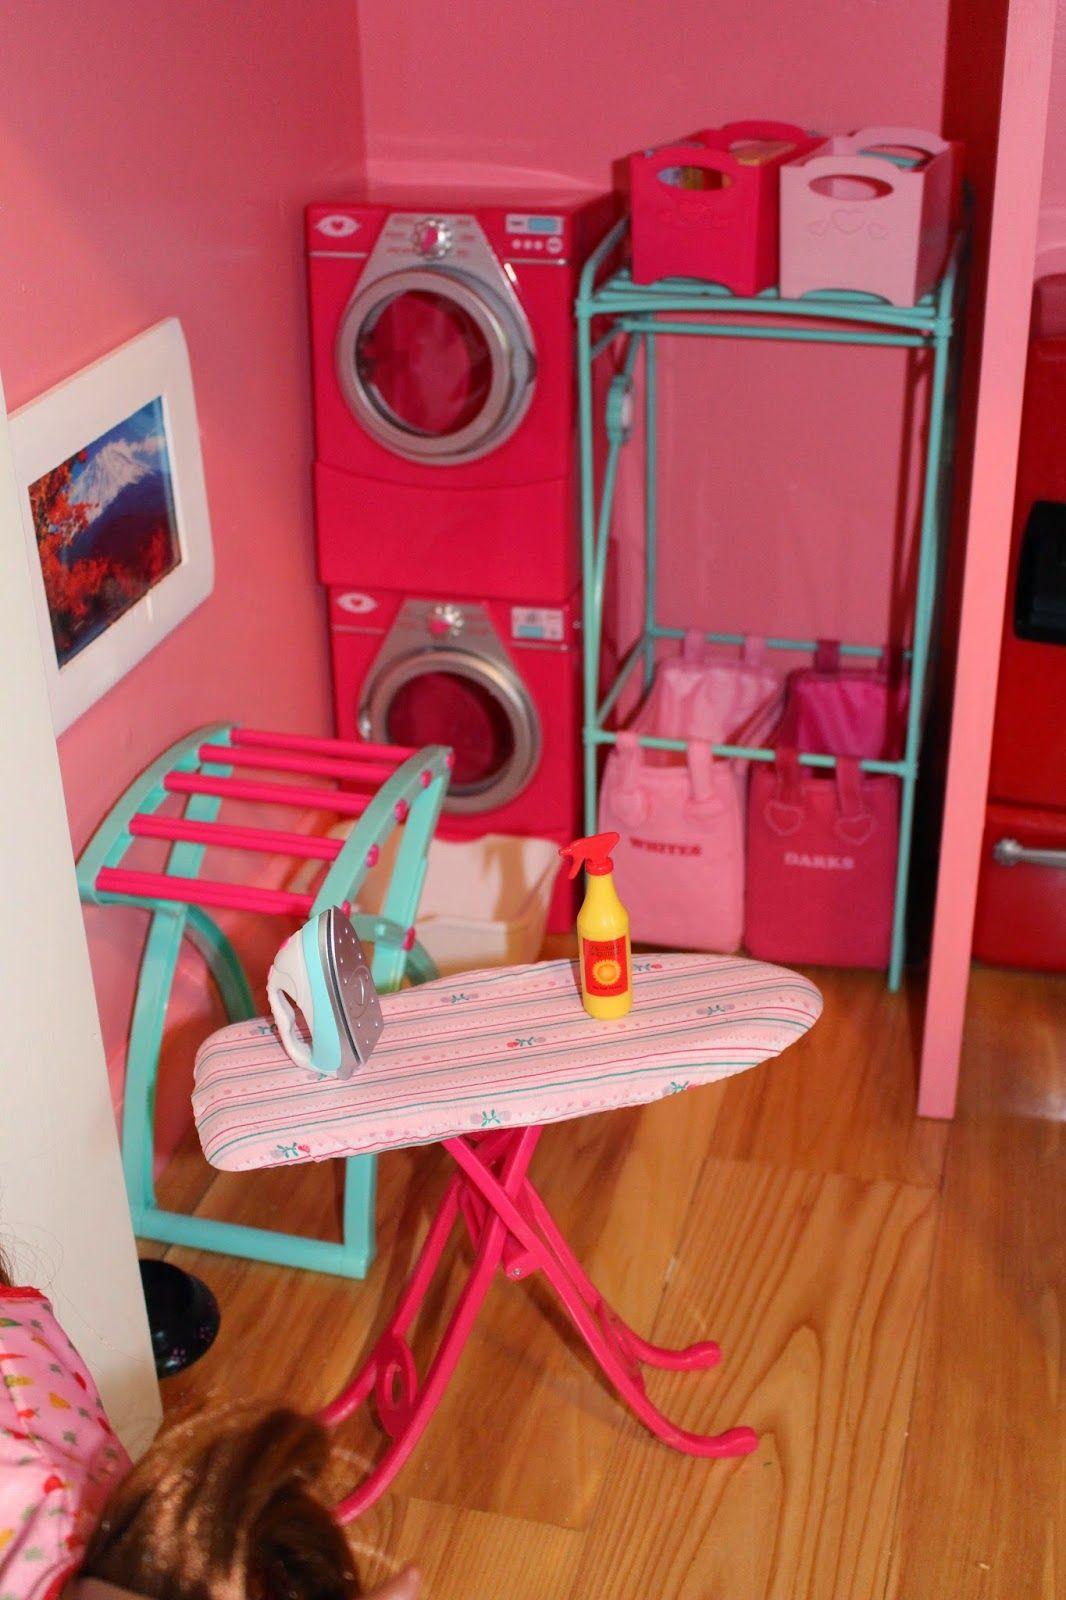 3rd bedroom | Girls dollhouse, American girl doll house